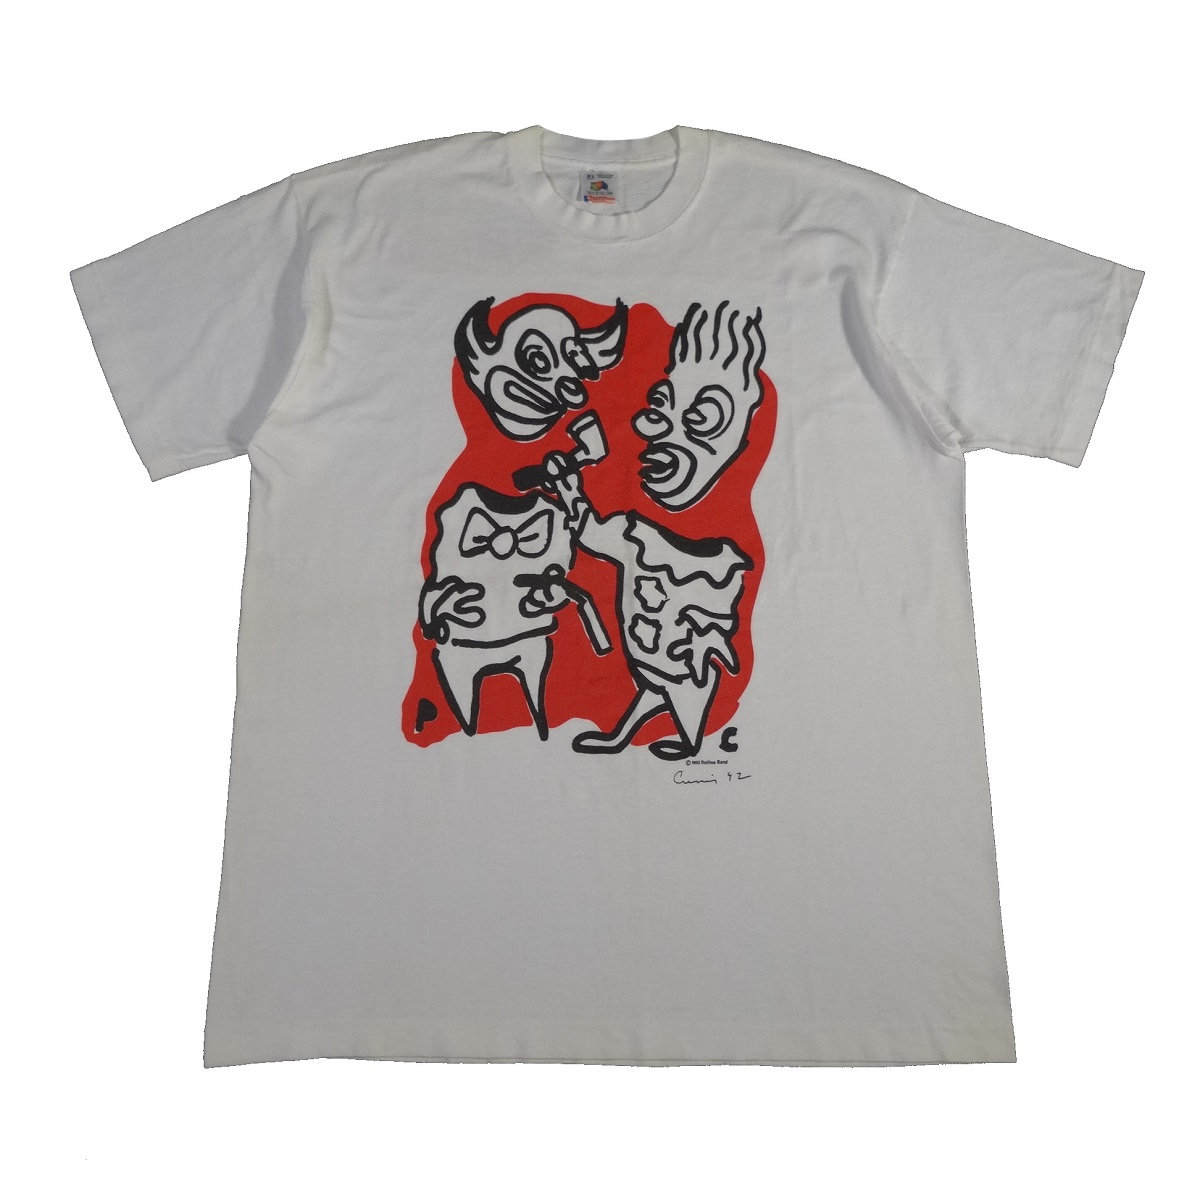 henry rollins band summer tour 1992 vintage t shirt front